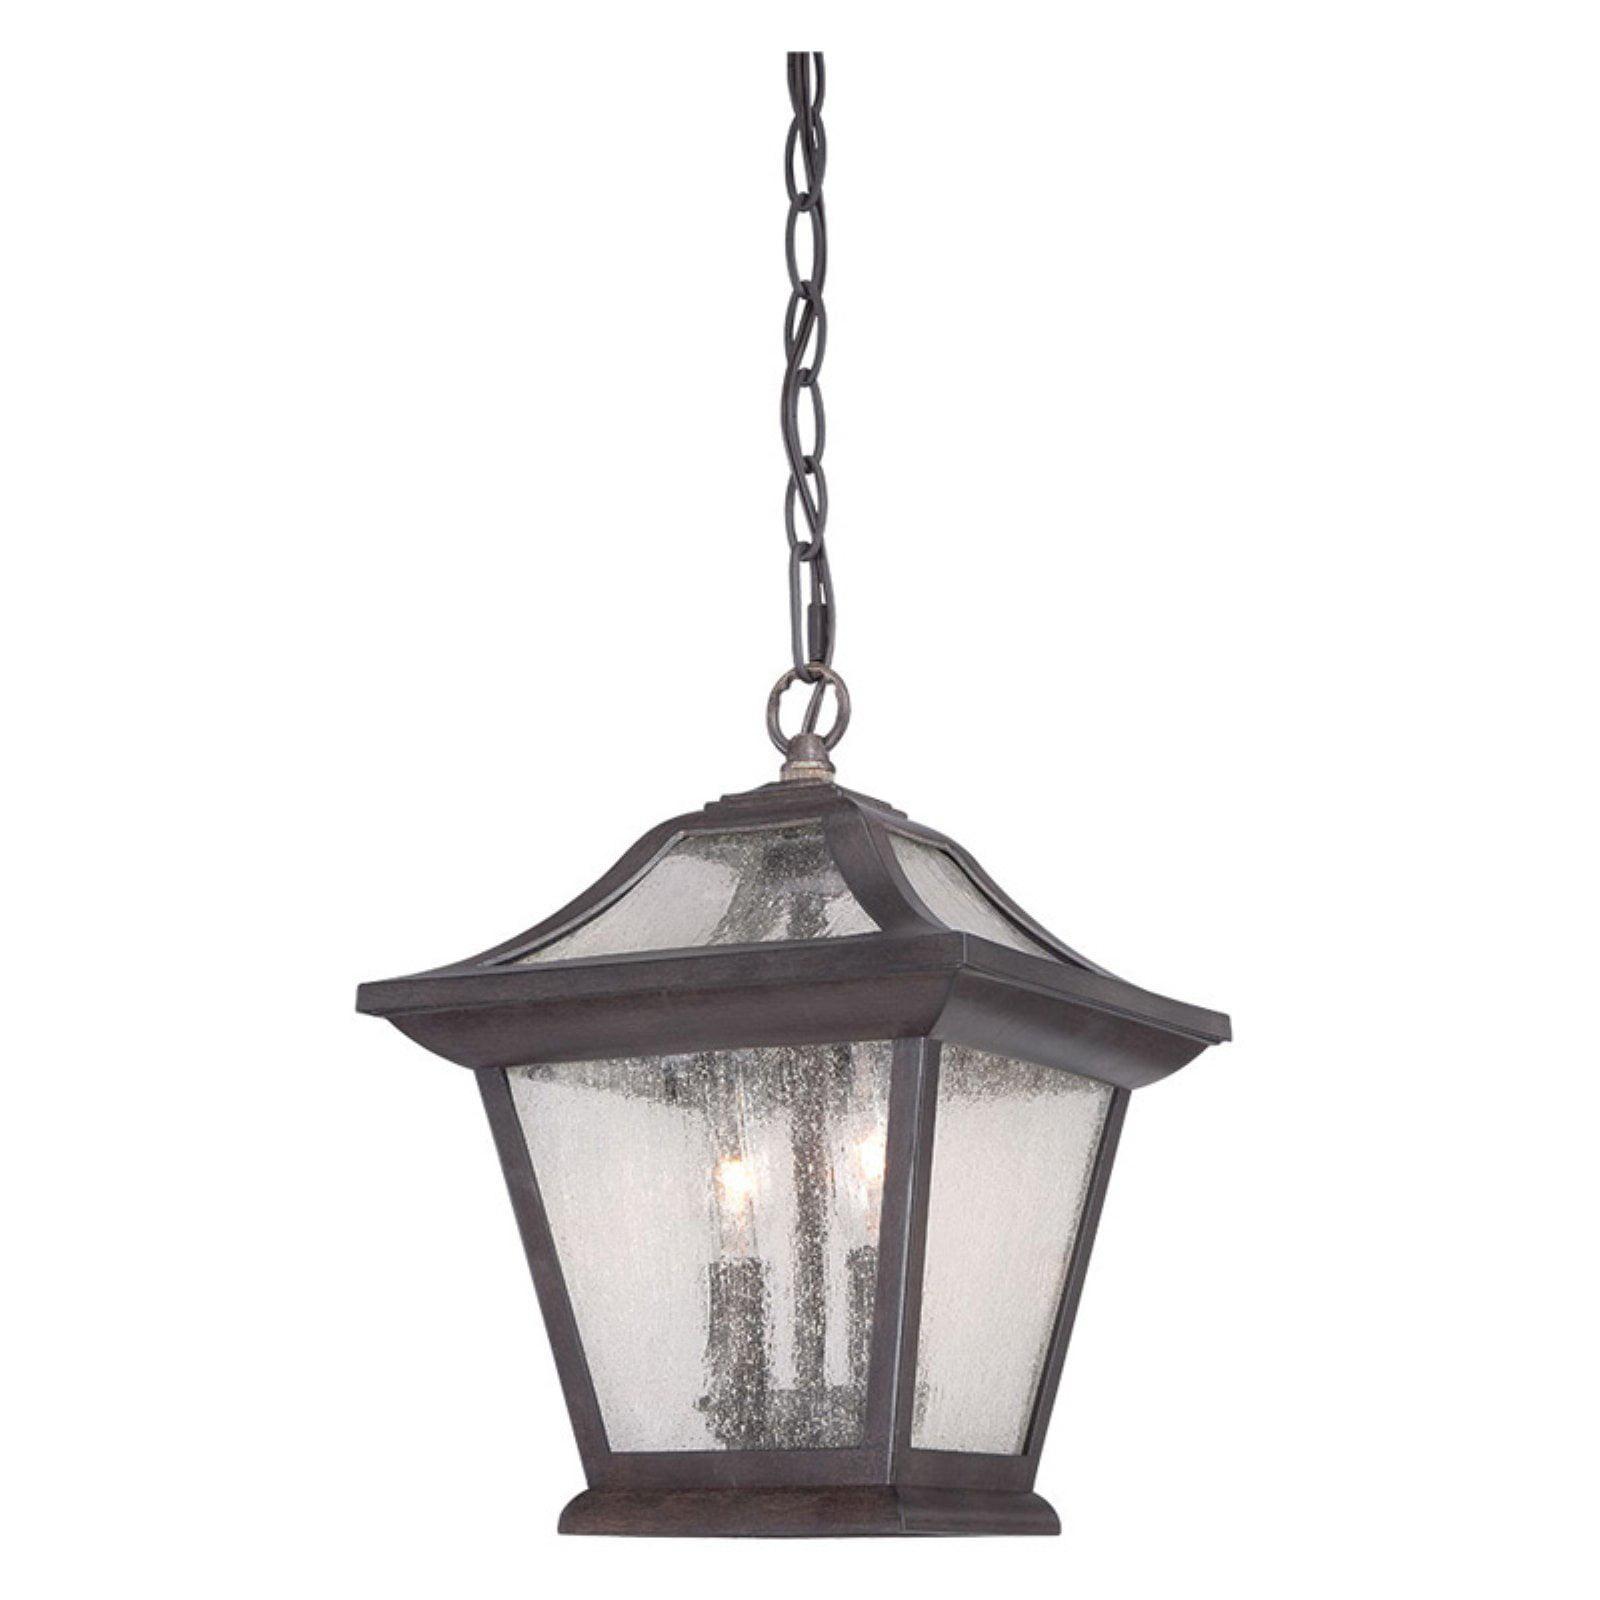 Acclaim Lighting Aiken Outdoor Hanging Lantern Light Fixture by Acclaim Lighting